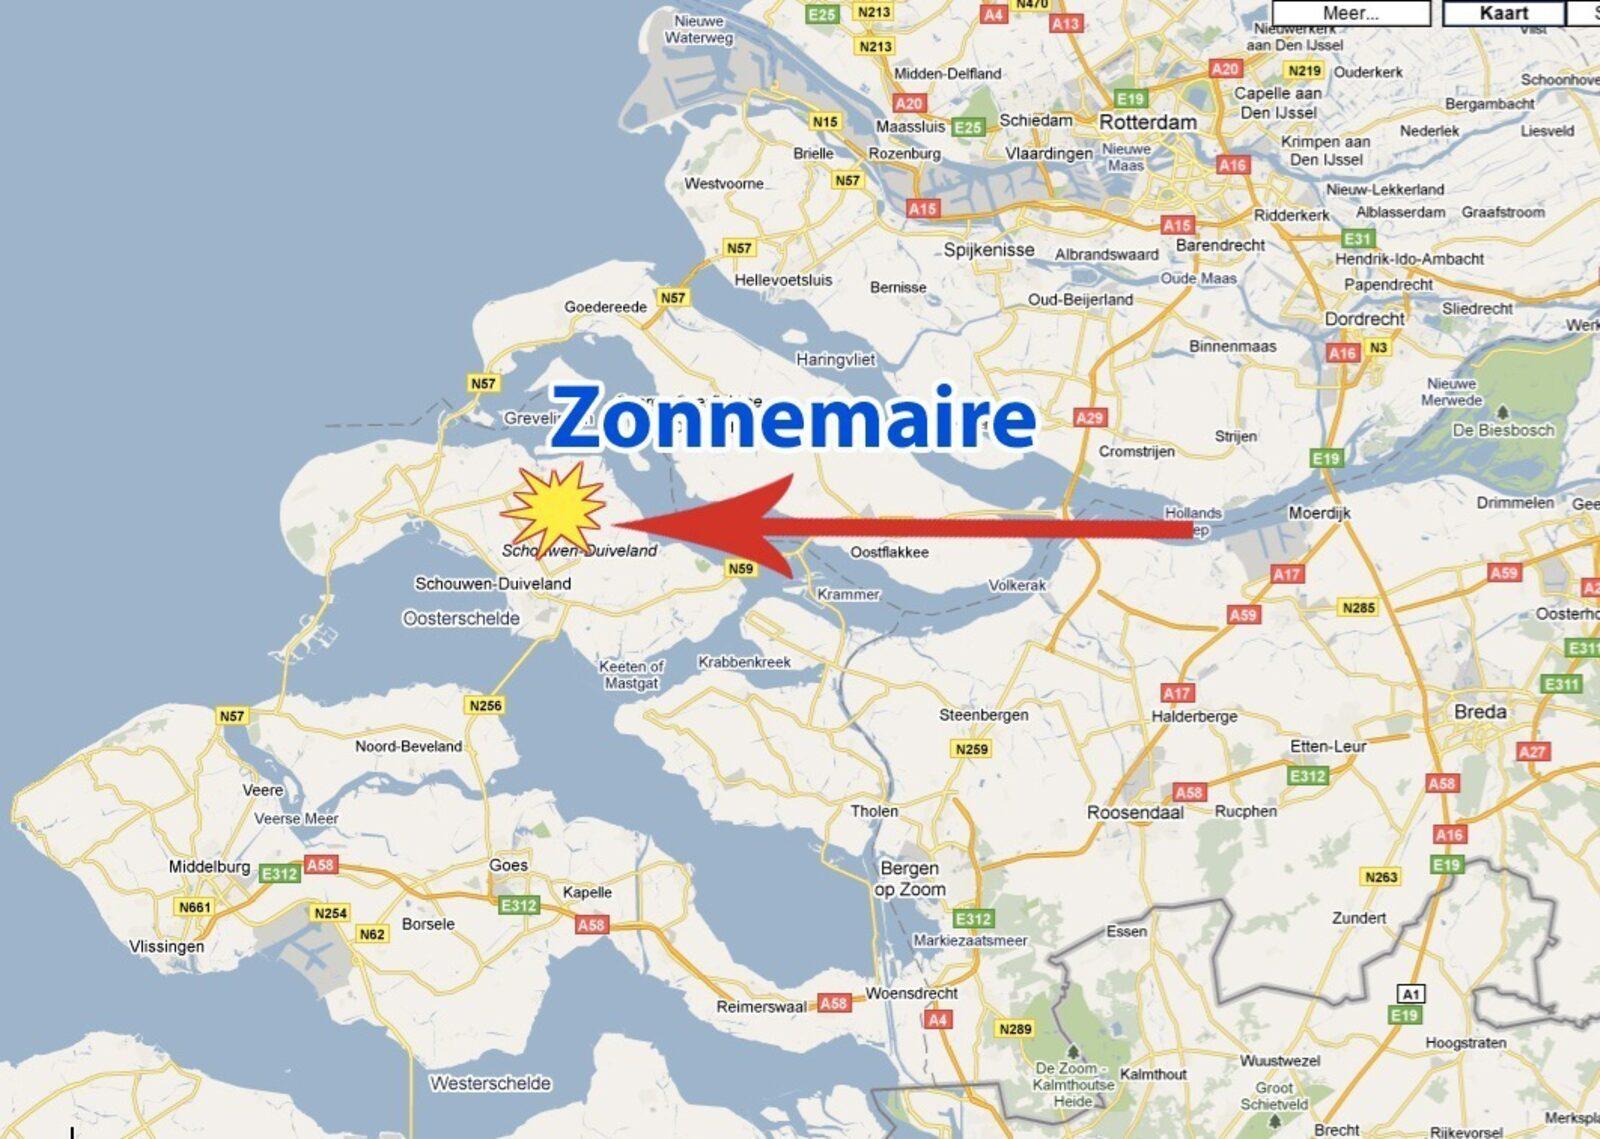 Vakantiewoning - Zuidweg 18 | Zonnemaire 'huisje Paola'